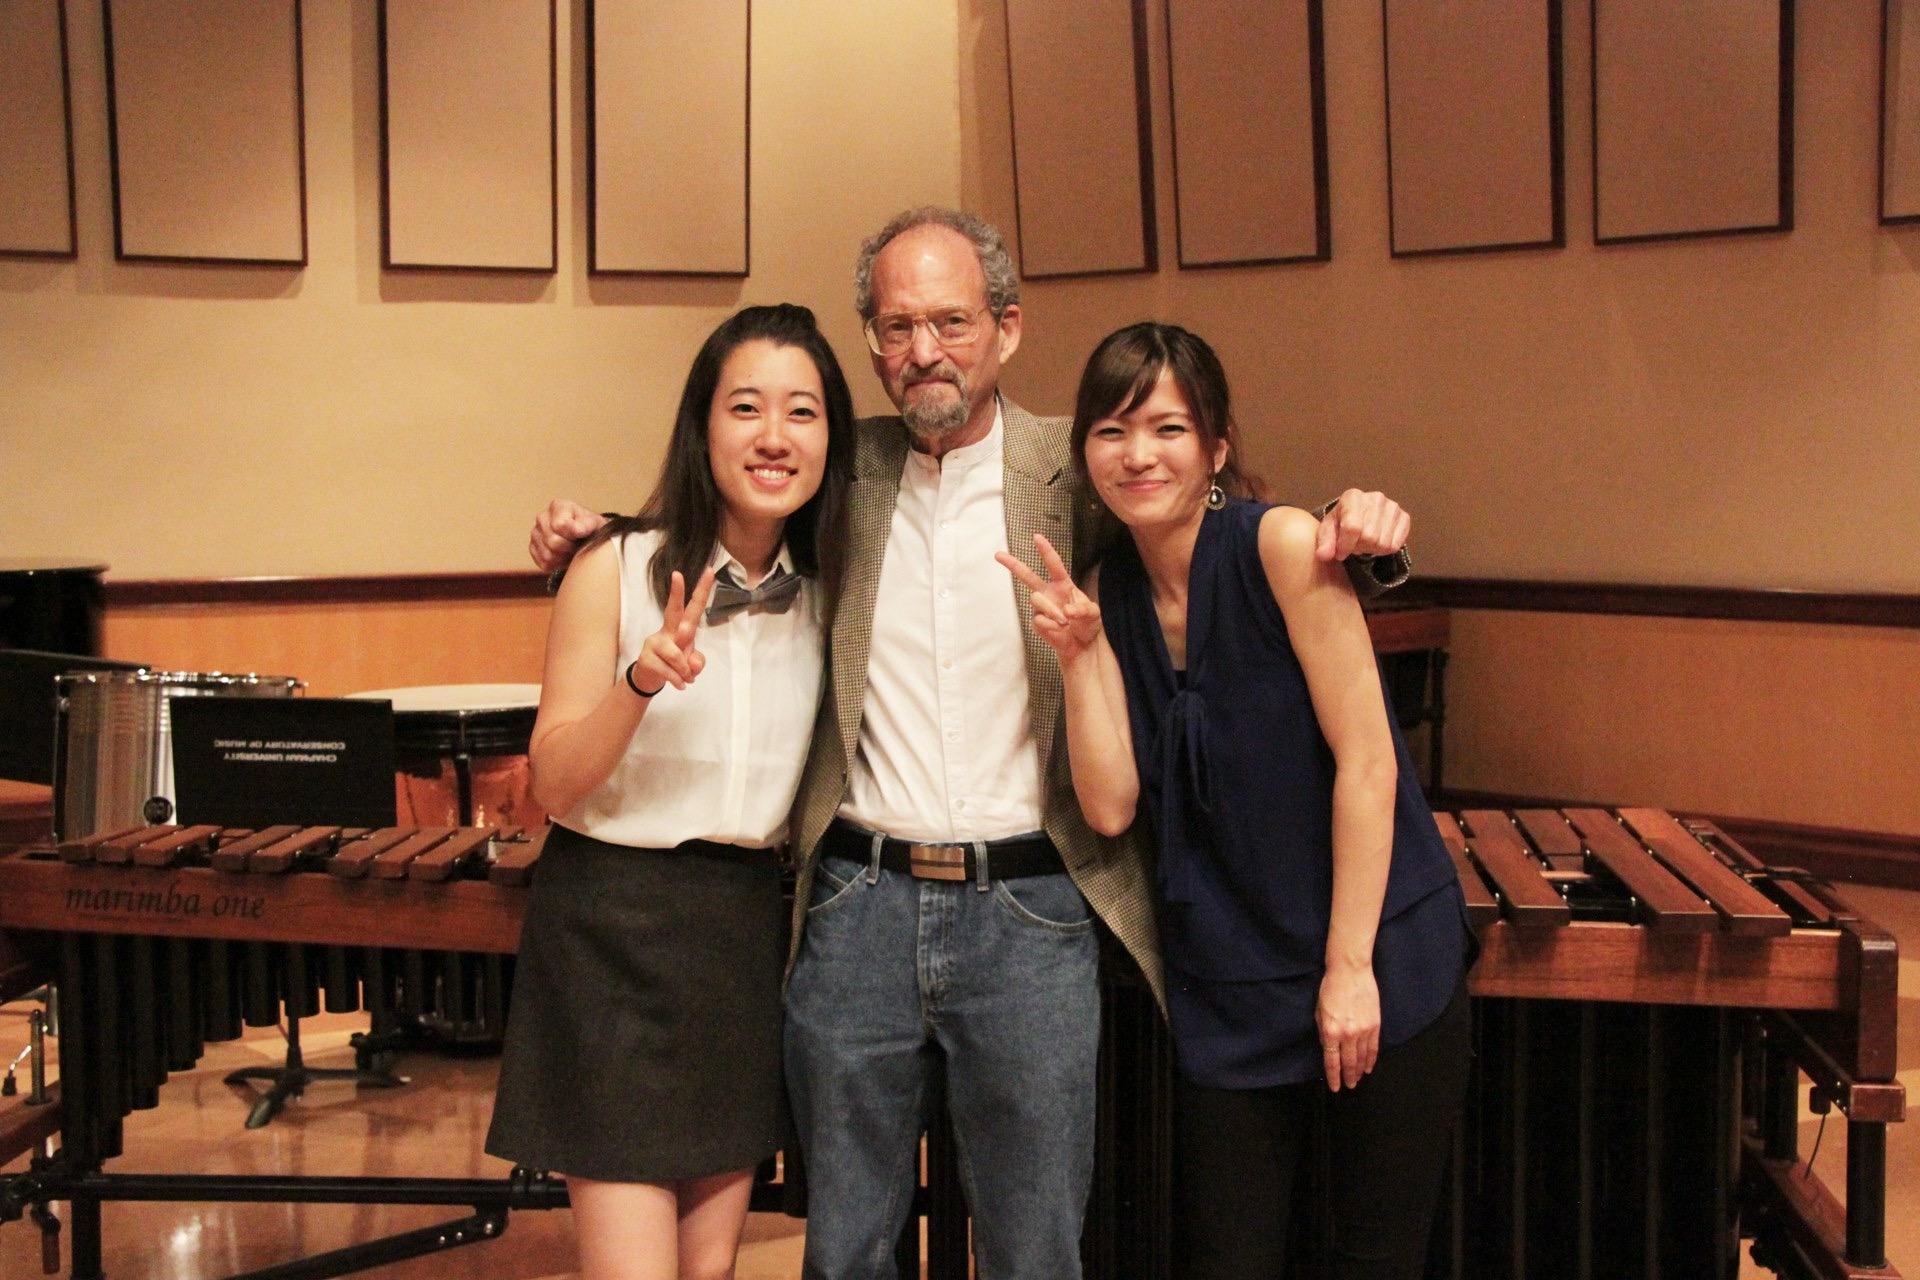 With Howard Hersh, Christina Cheon